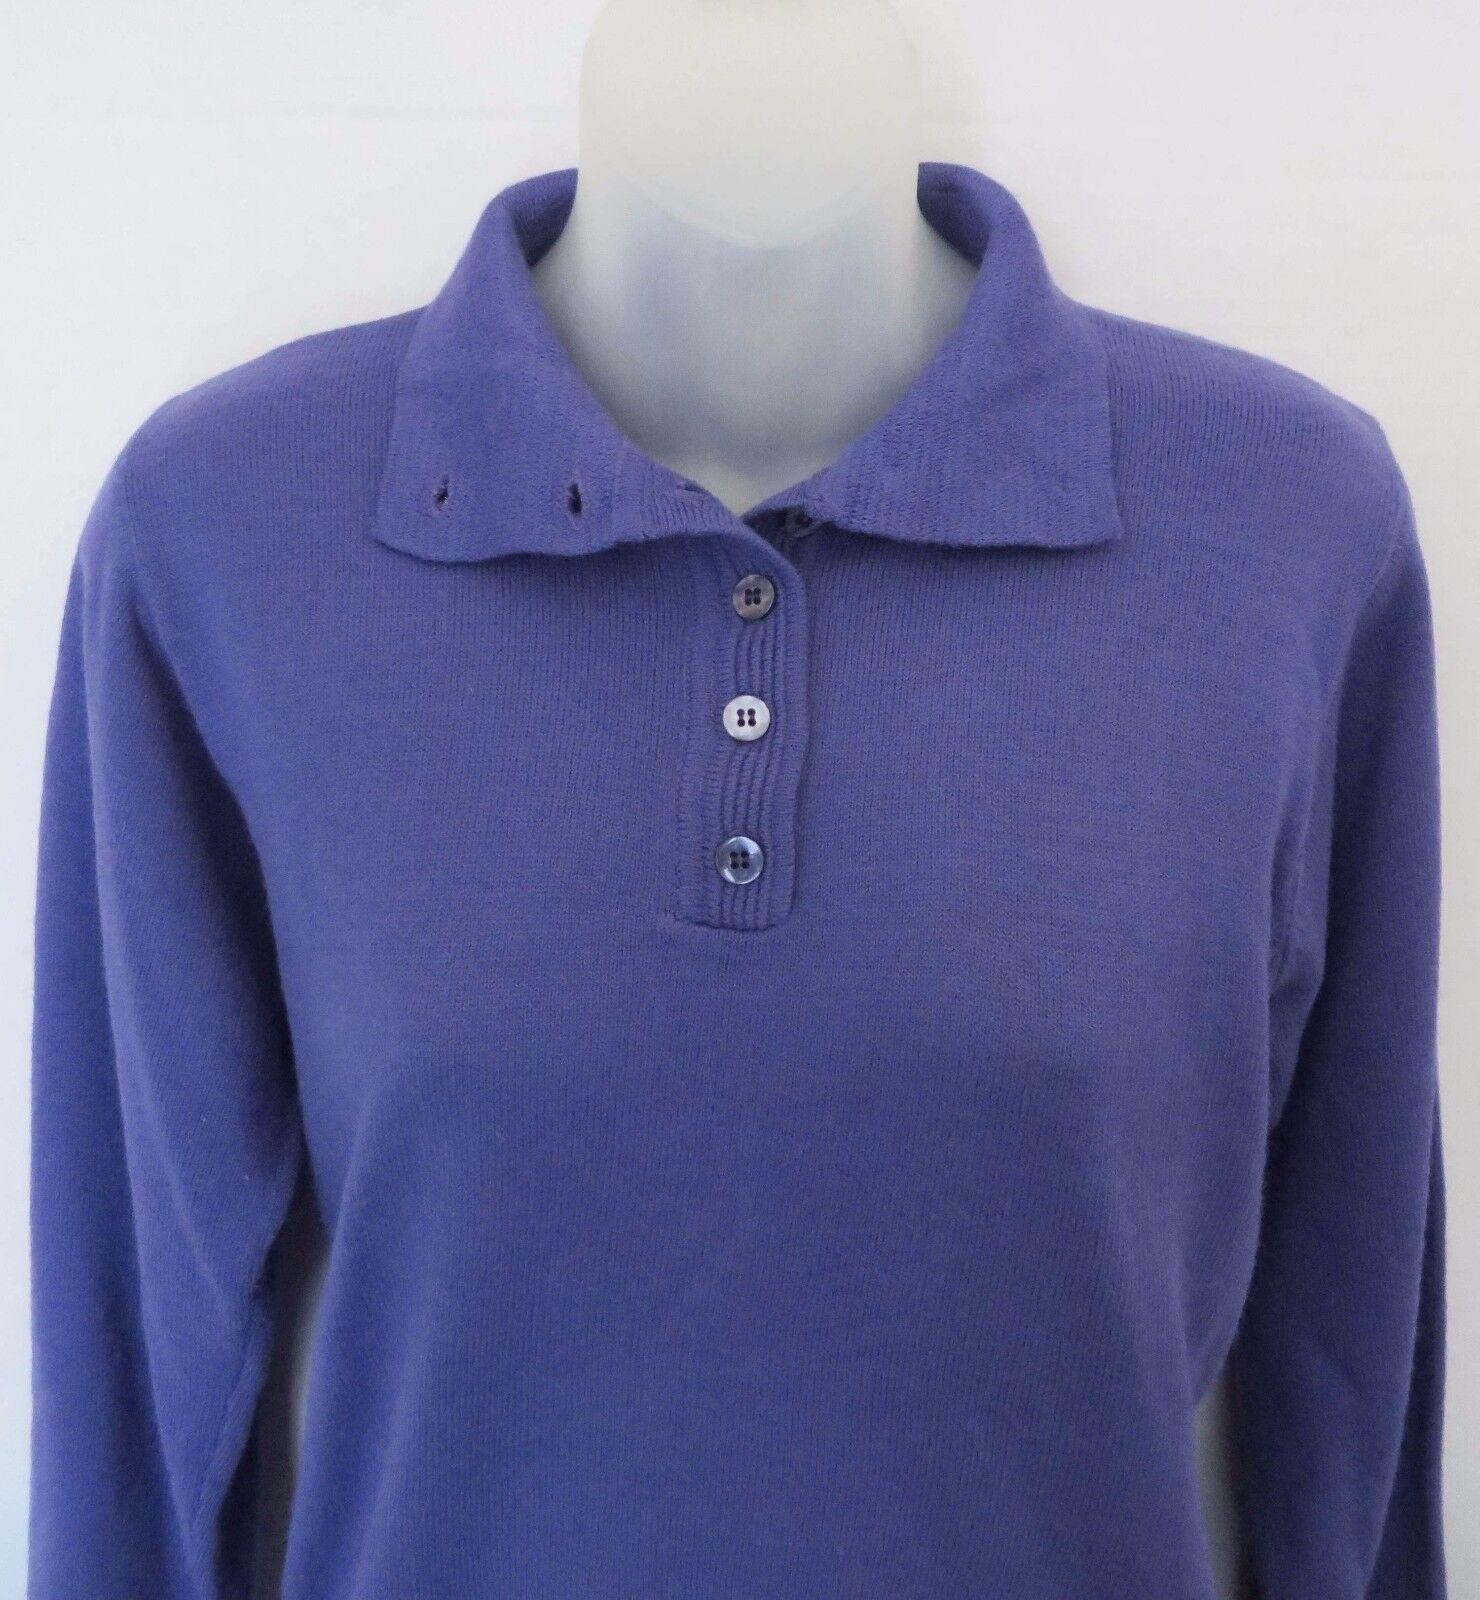 APPLESEED'S Appleseeds Purple Knit Button Sweater Shirt Top Women Size S